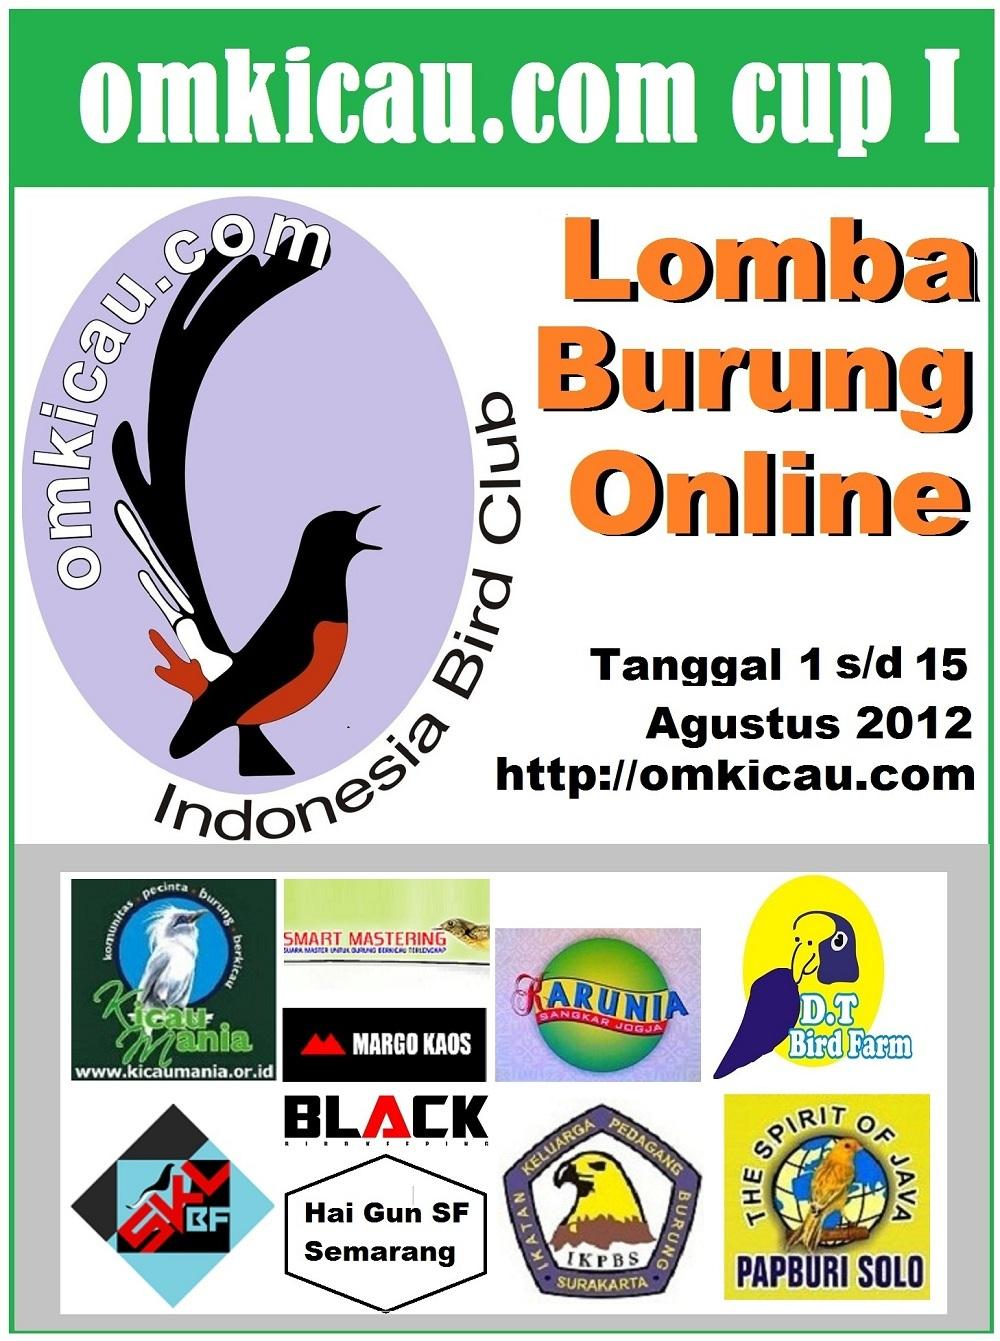 LOGO LOMBA BURUNG ONLINE OMKICAU.COM CUP I - REVISI